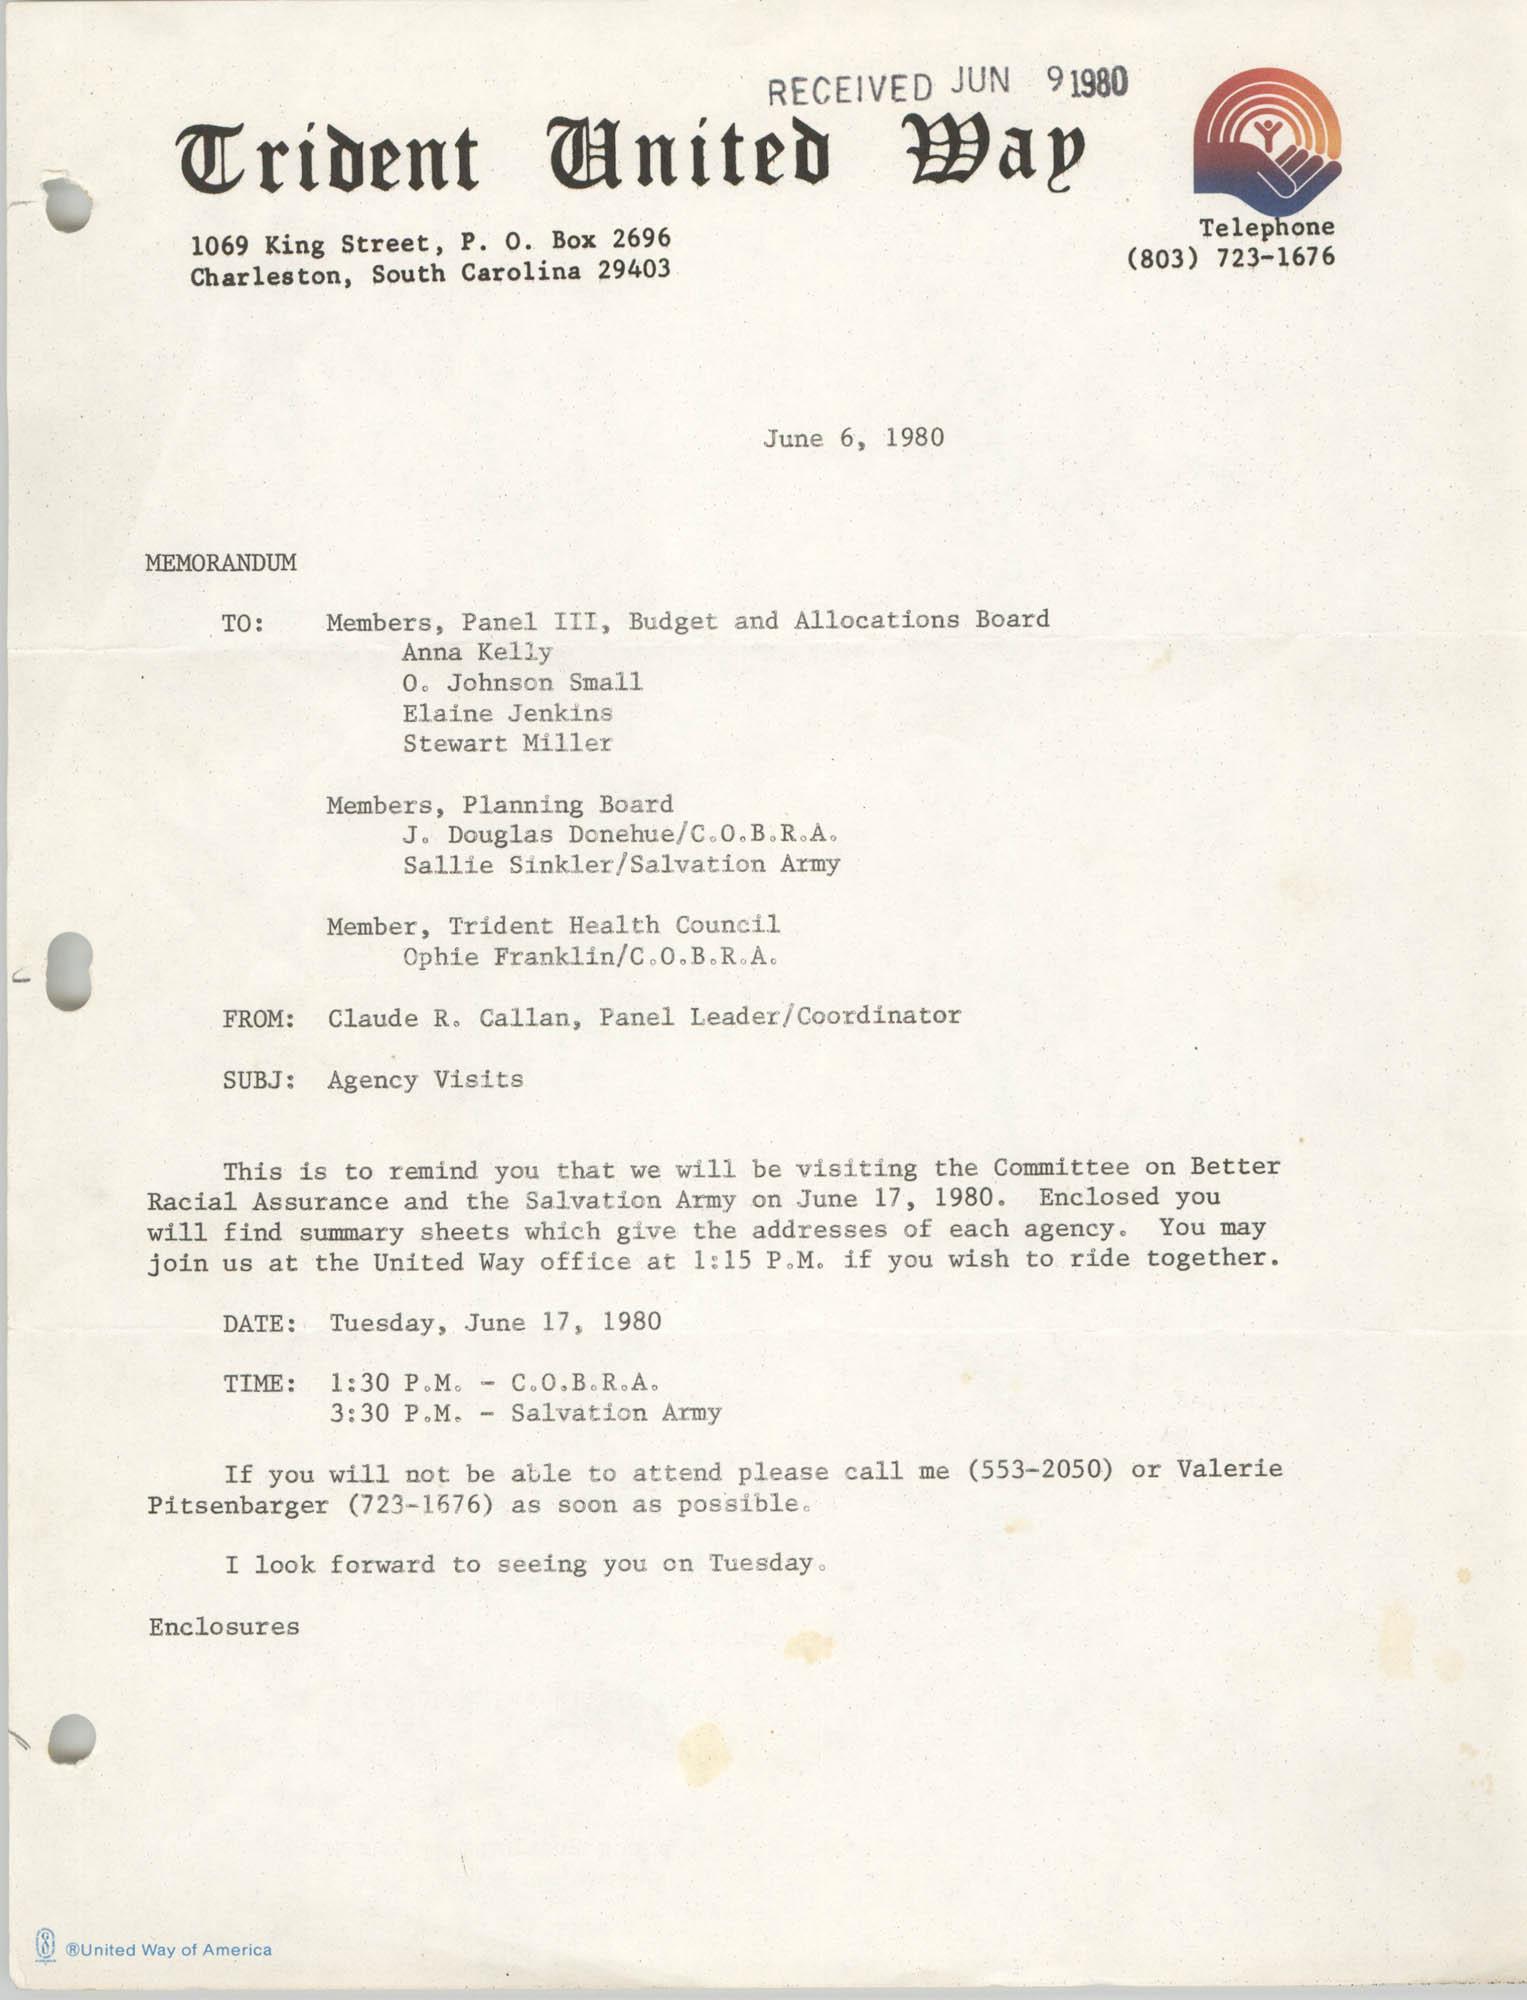 Trident United Way Memorandum, June 6, 1980